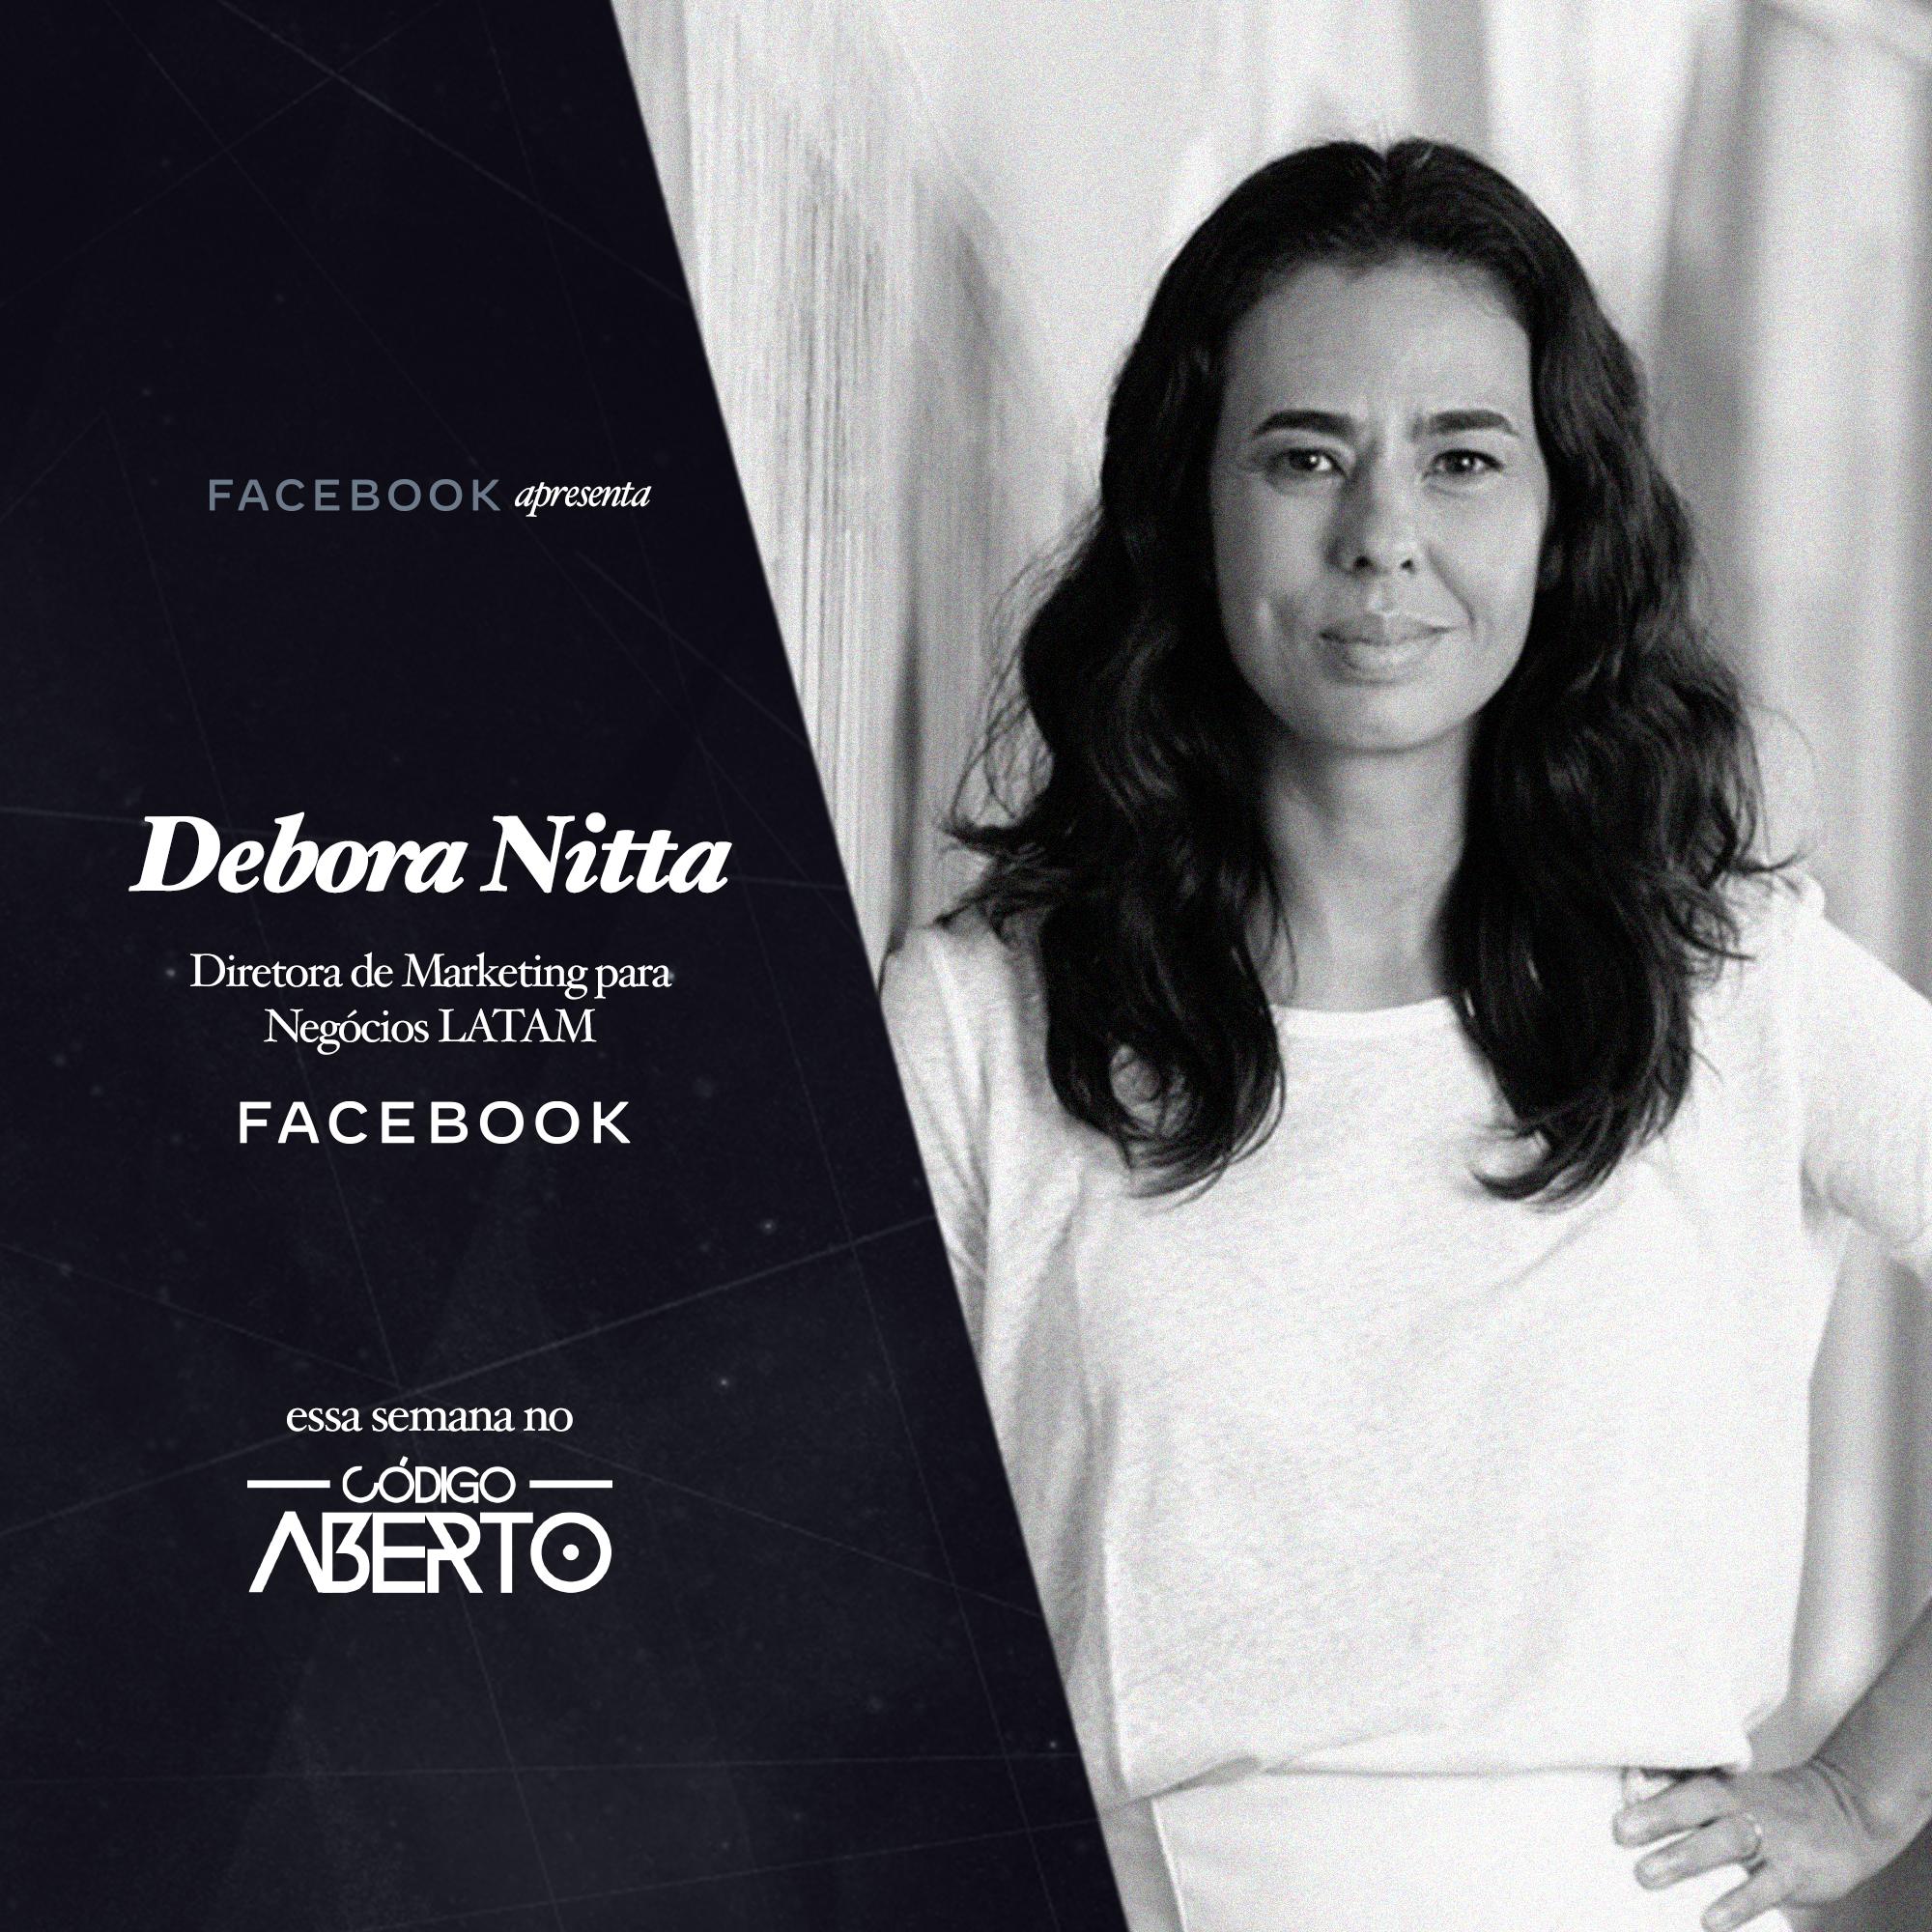 Capa - Débora Nitta, Diretora de Marketing para Negócios LATAM, Facebook Brasil